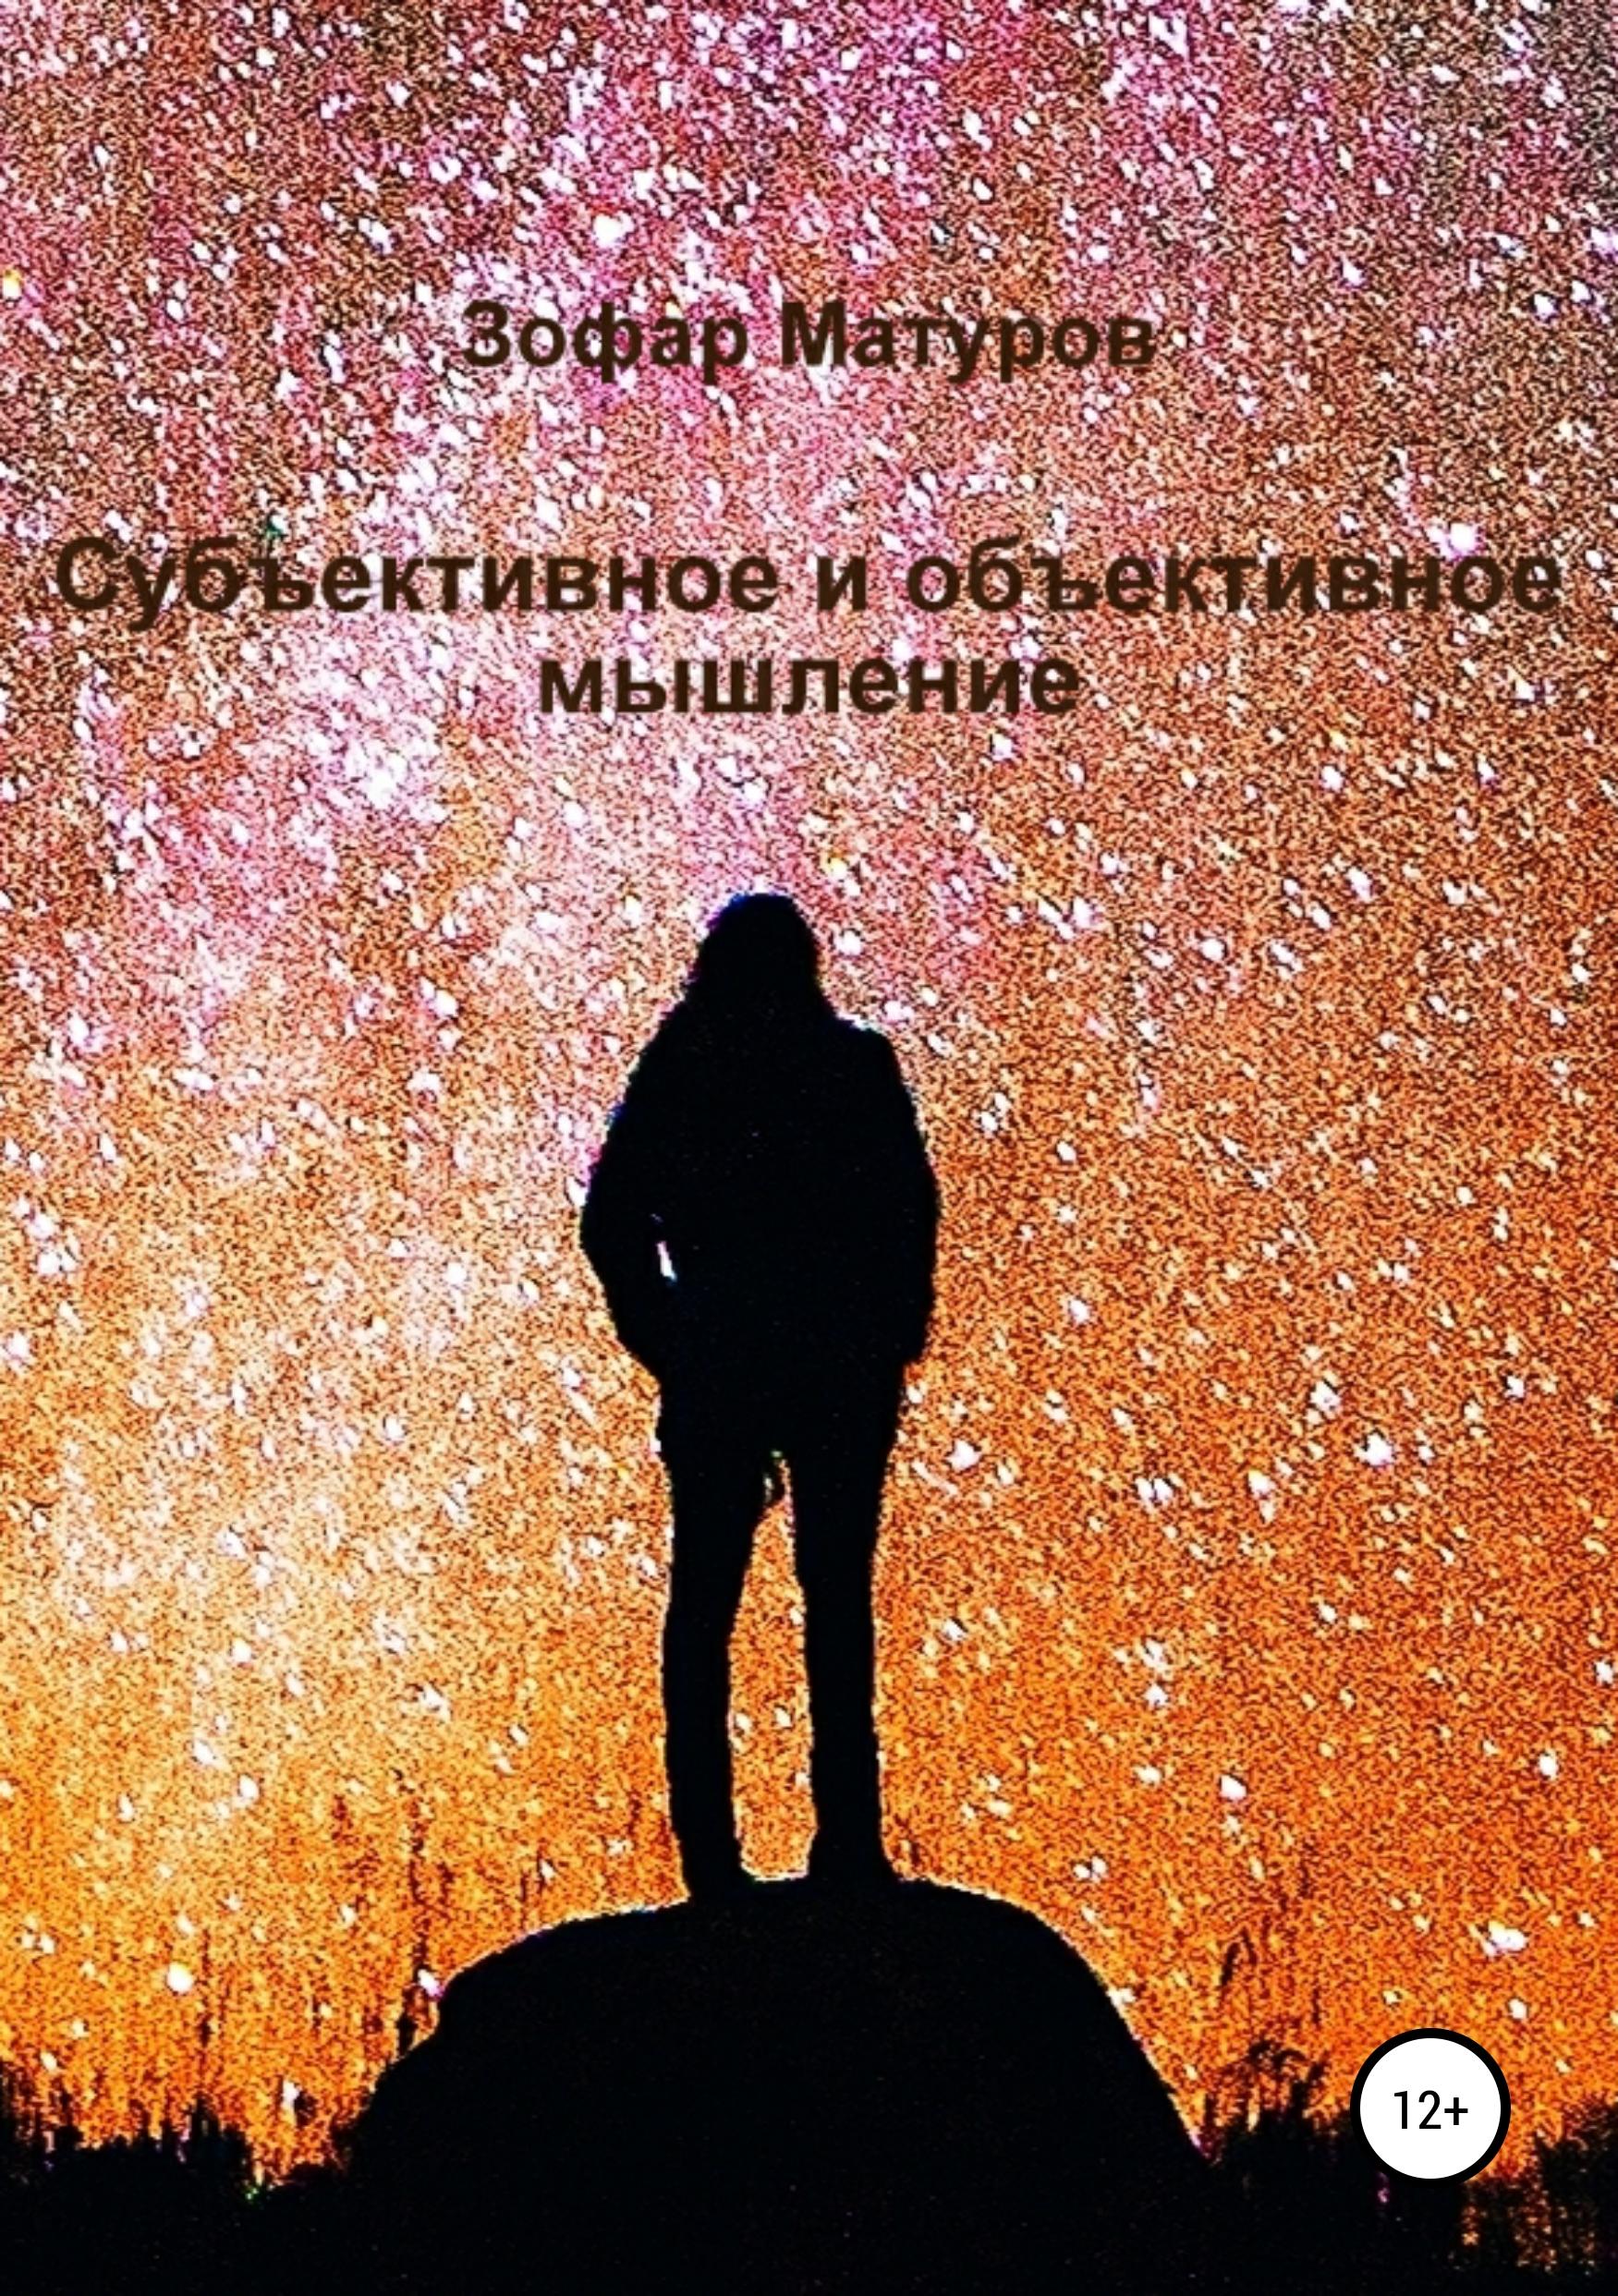 Зофар Загидович Матуров Субъективное и объективное мышление цена и фото